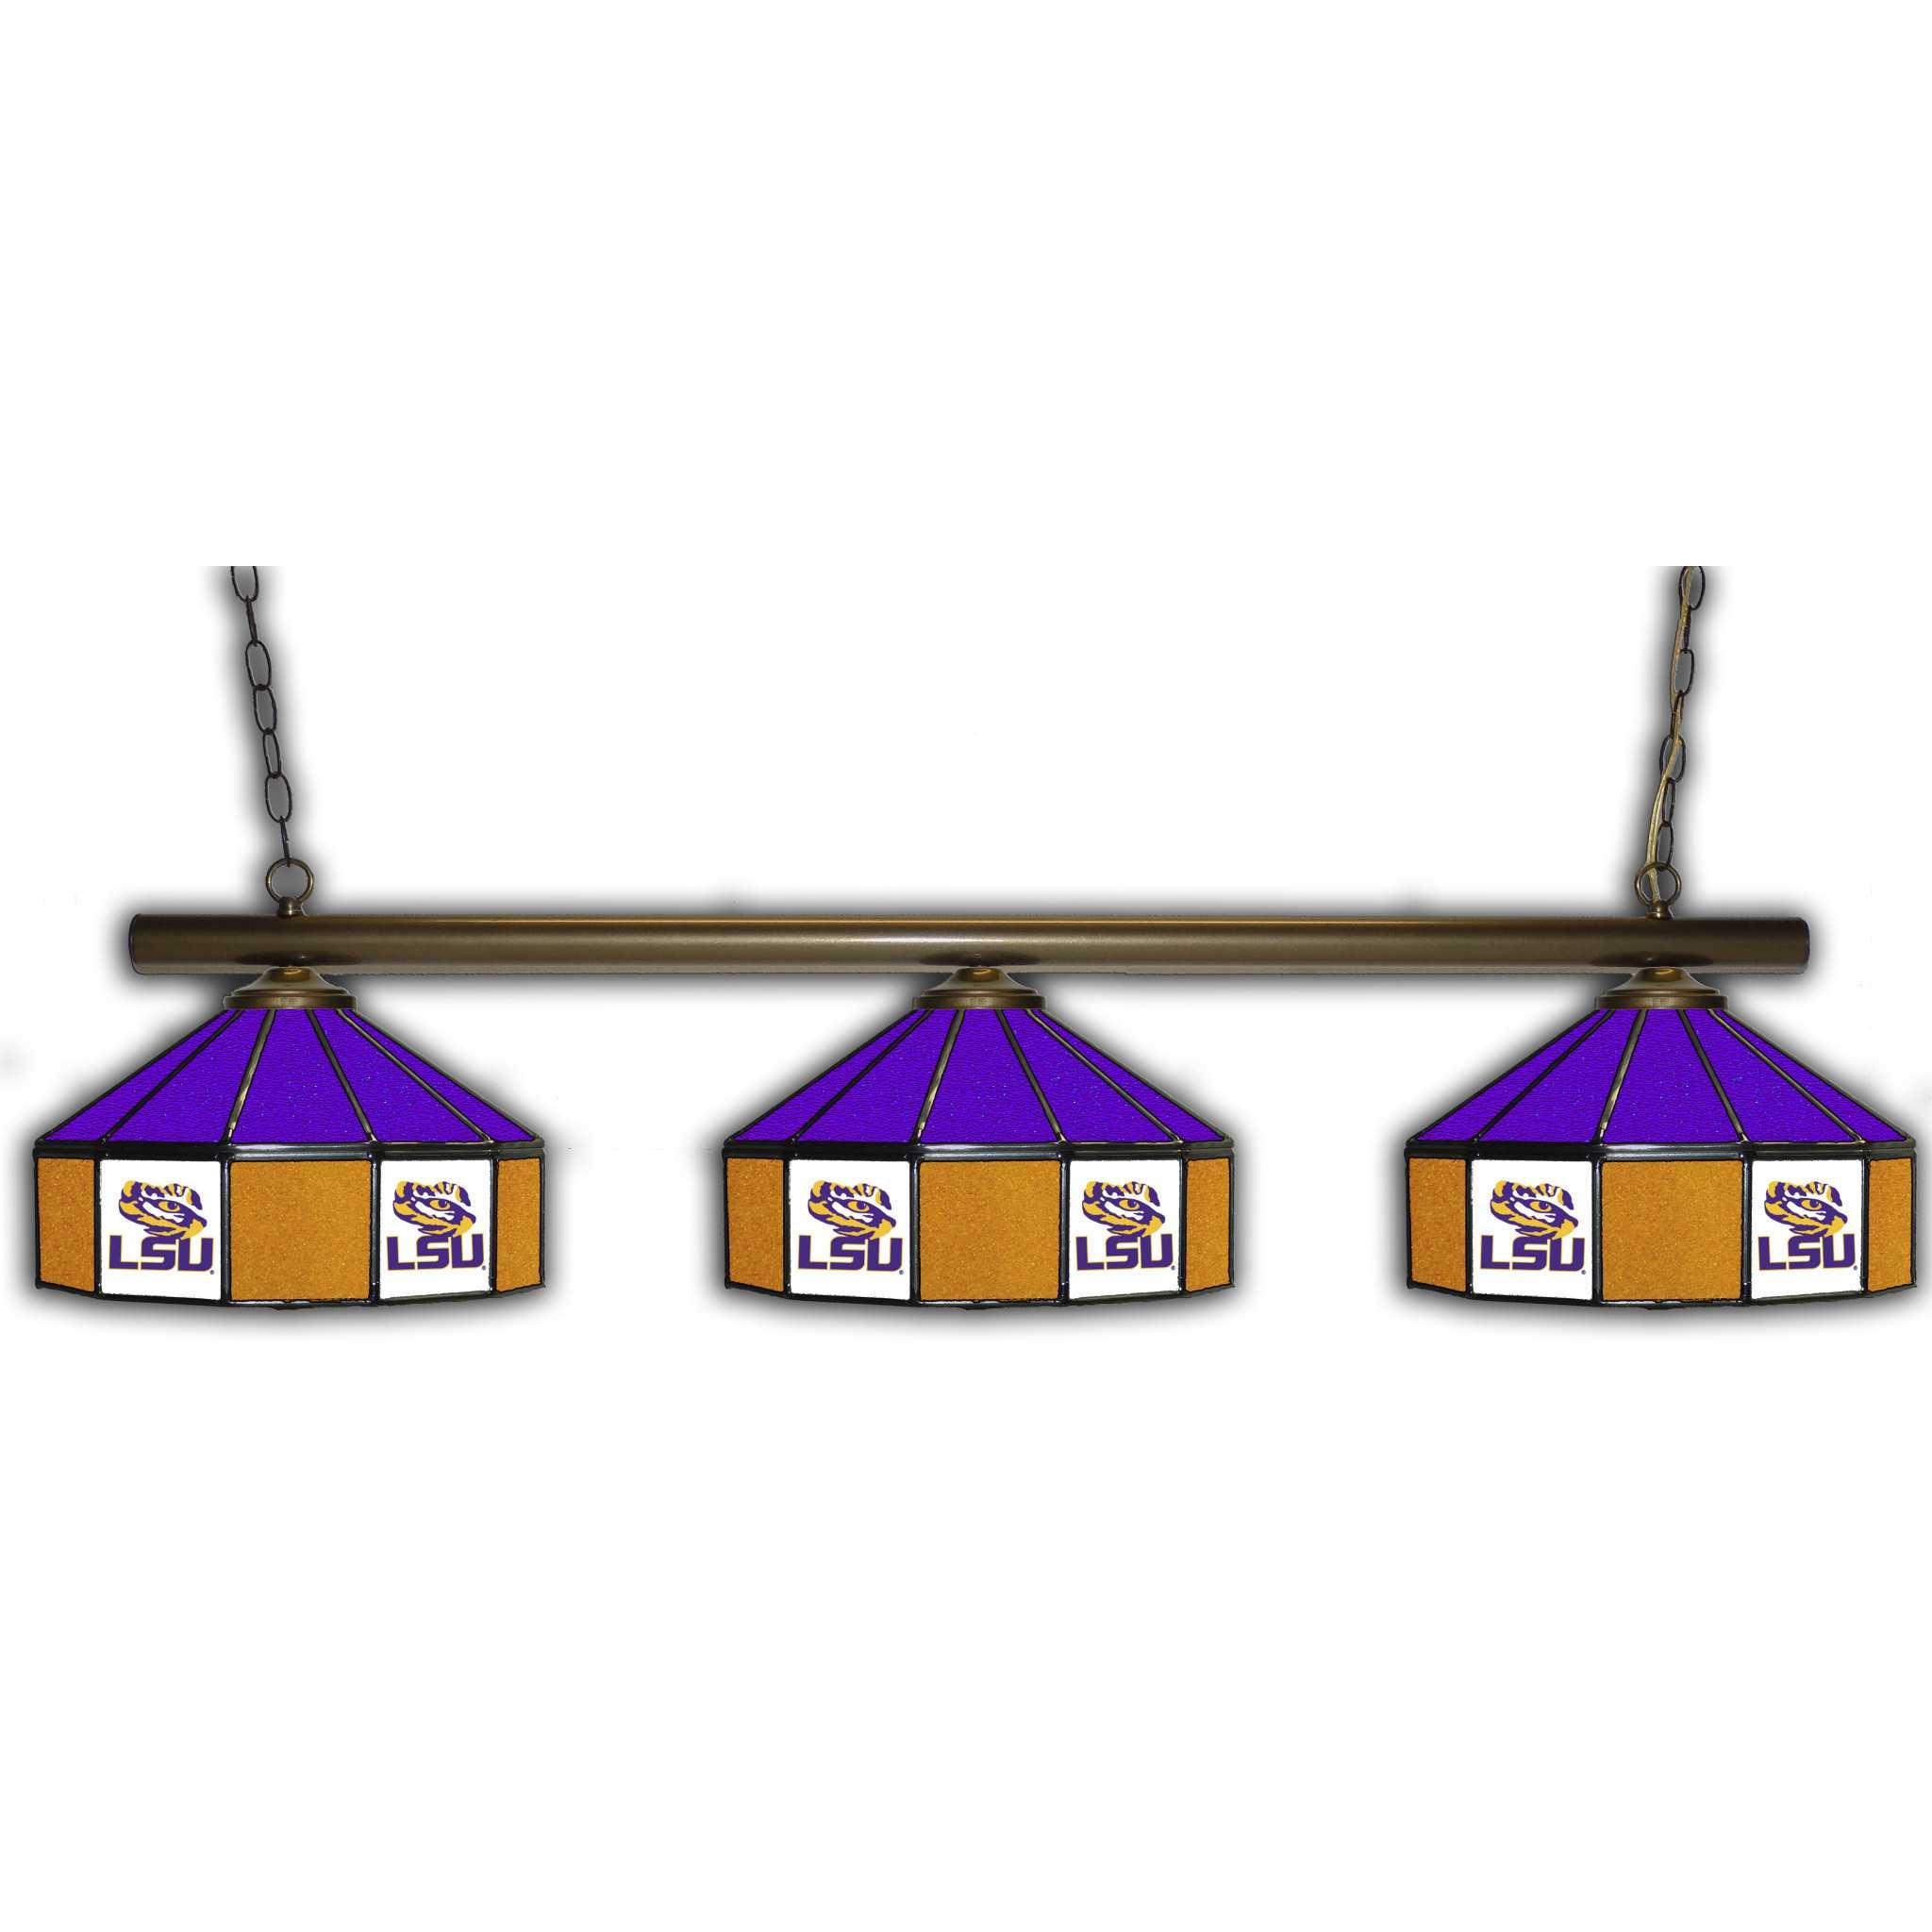 LSU TIGERS 3 SHADE GLASS LAMP